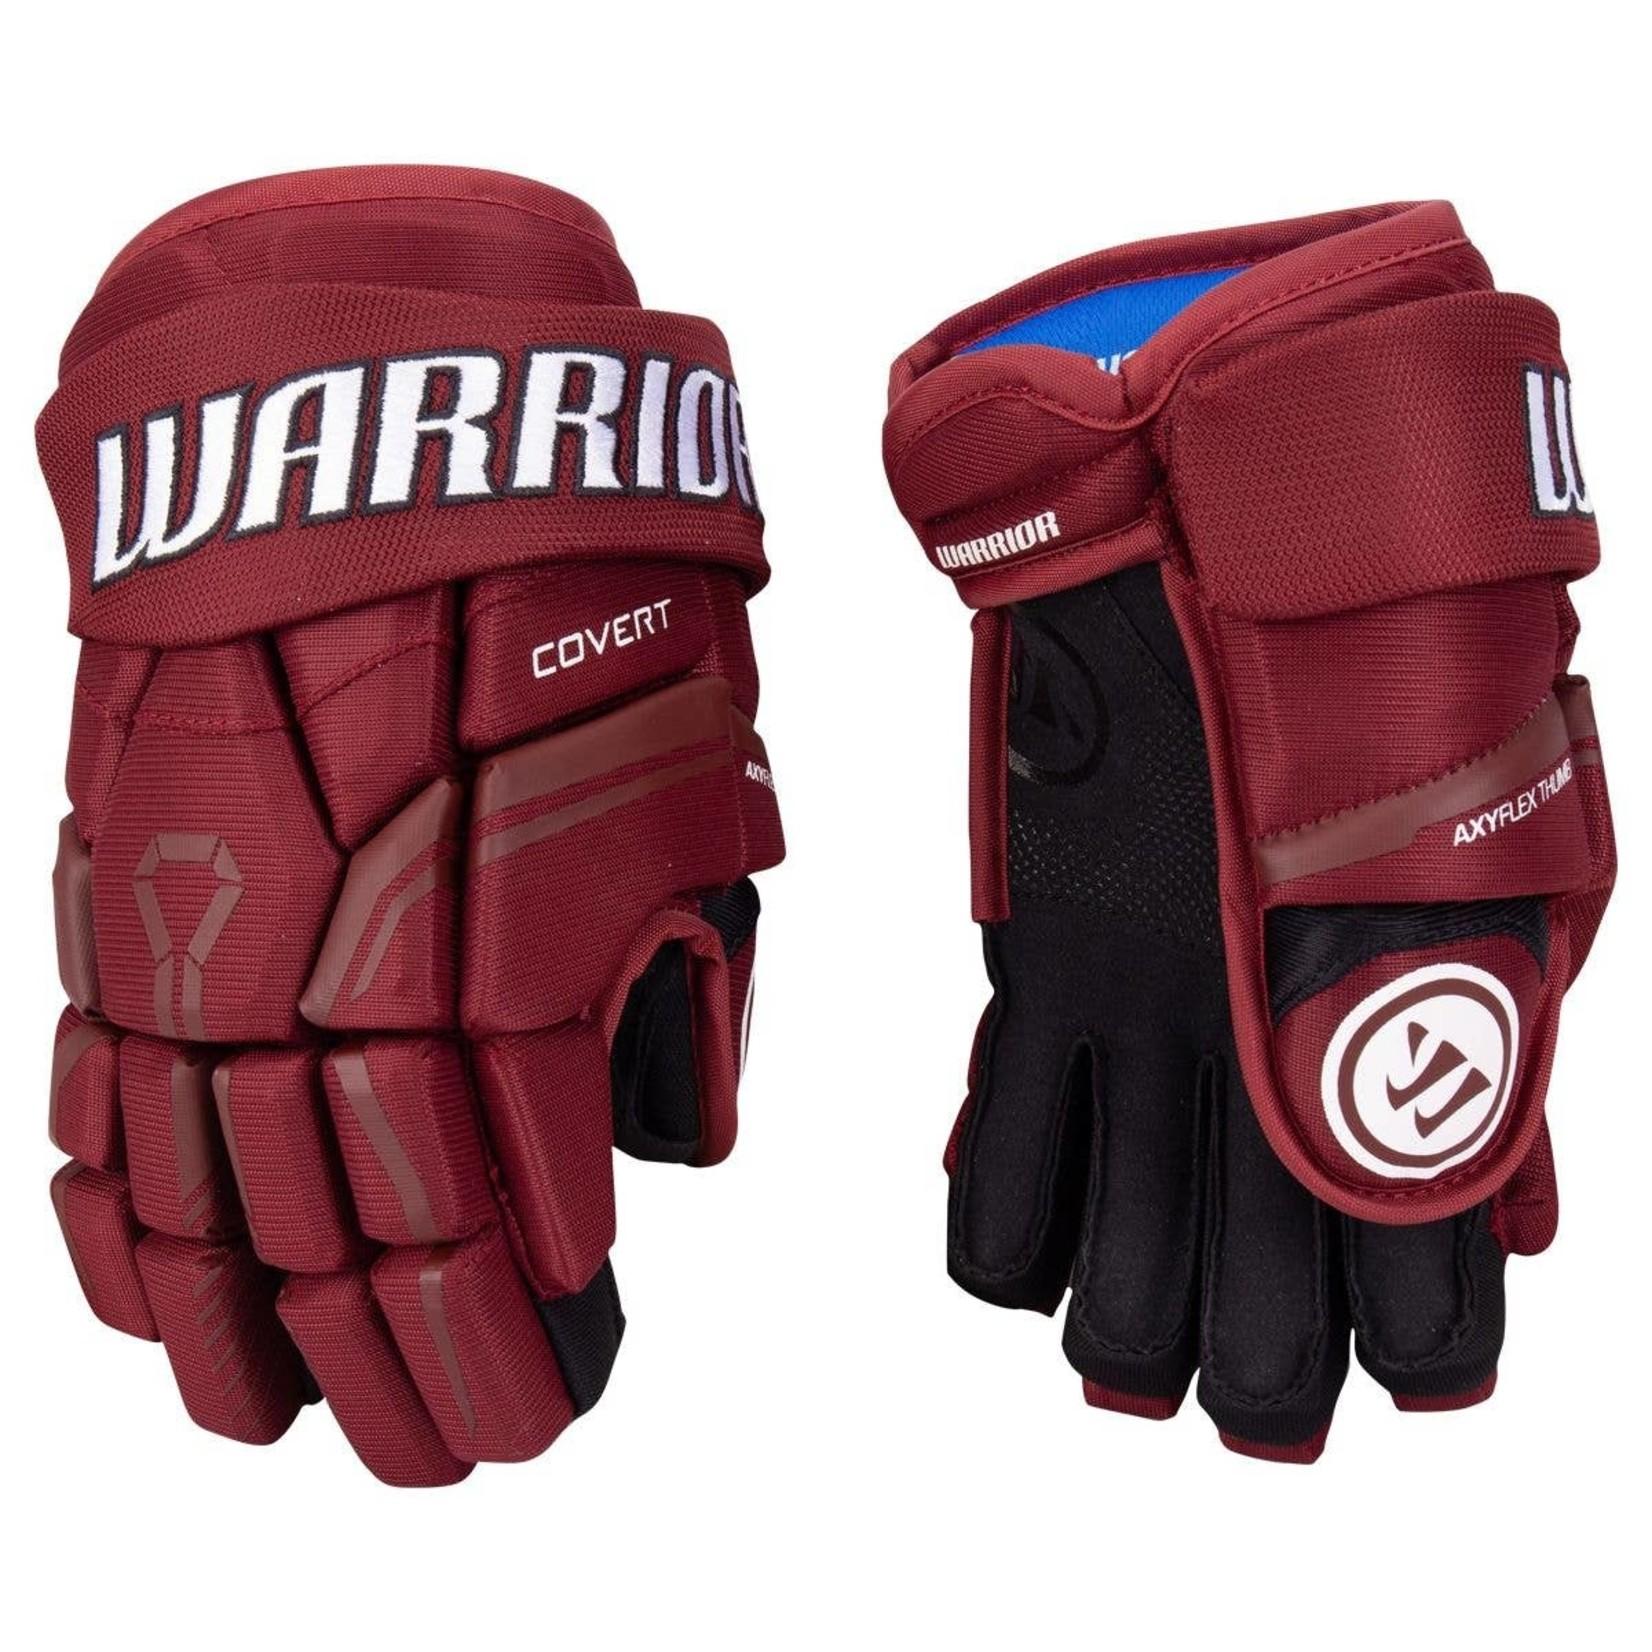 Warrior Warrior Hockey Gloves, Covert QRE 30, Junior